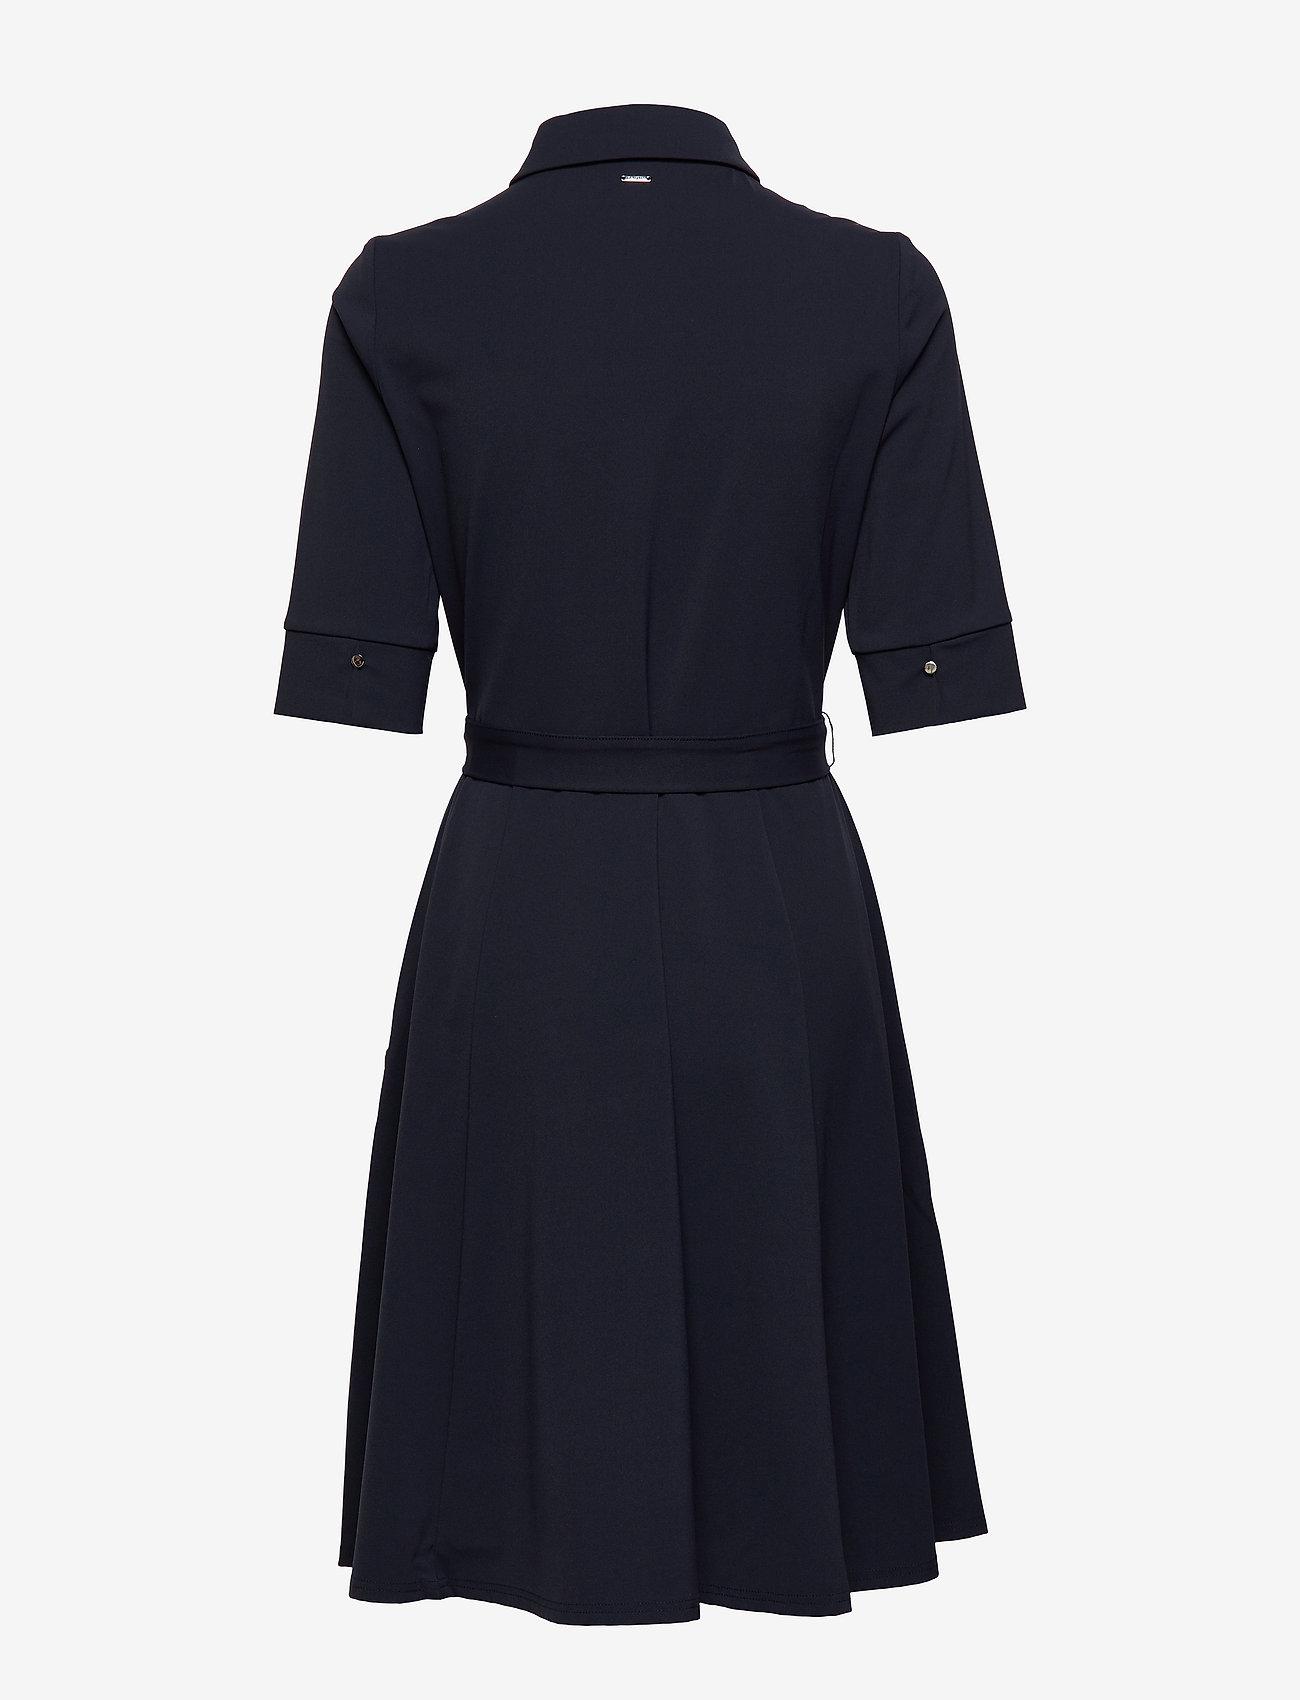 Taifun - DRESS WOVEN FABRIC - skjortklänningar - blue shadow - 1